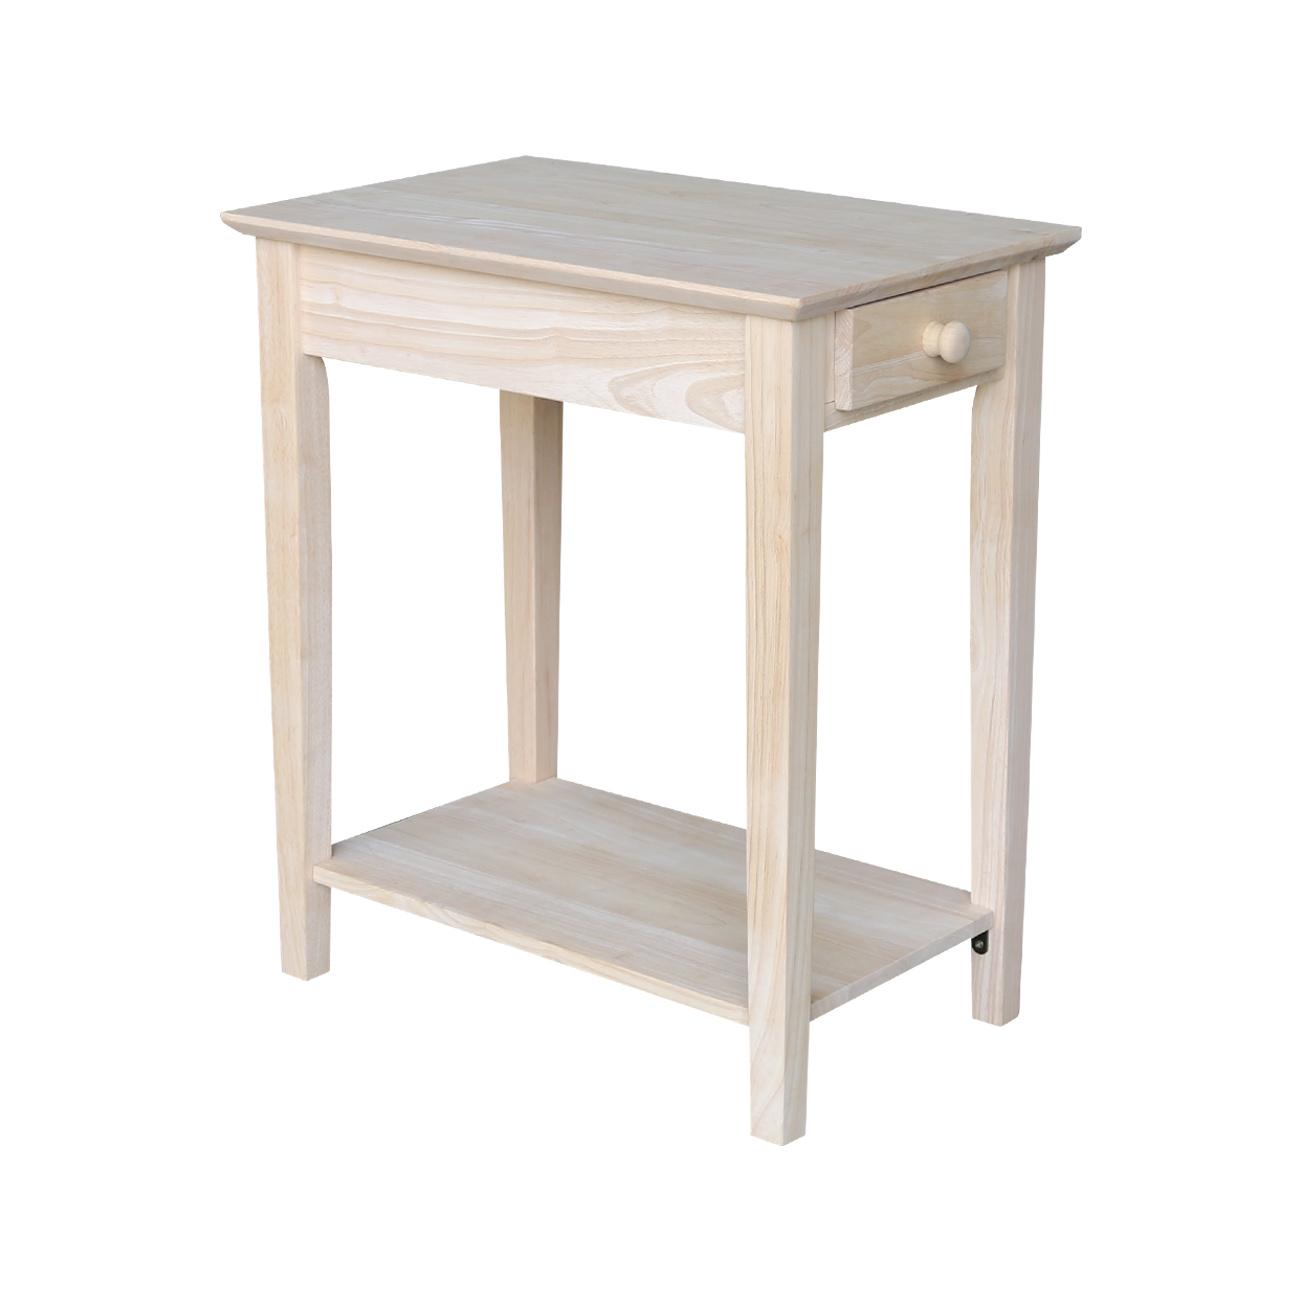 International Concepts Narrow End Table - Walmart.com